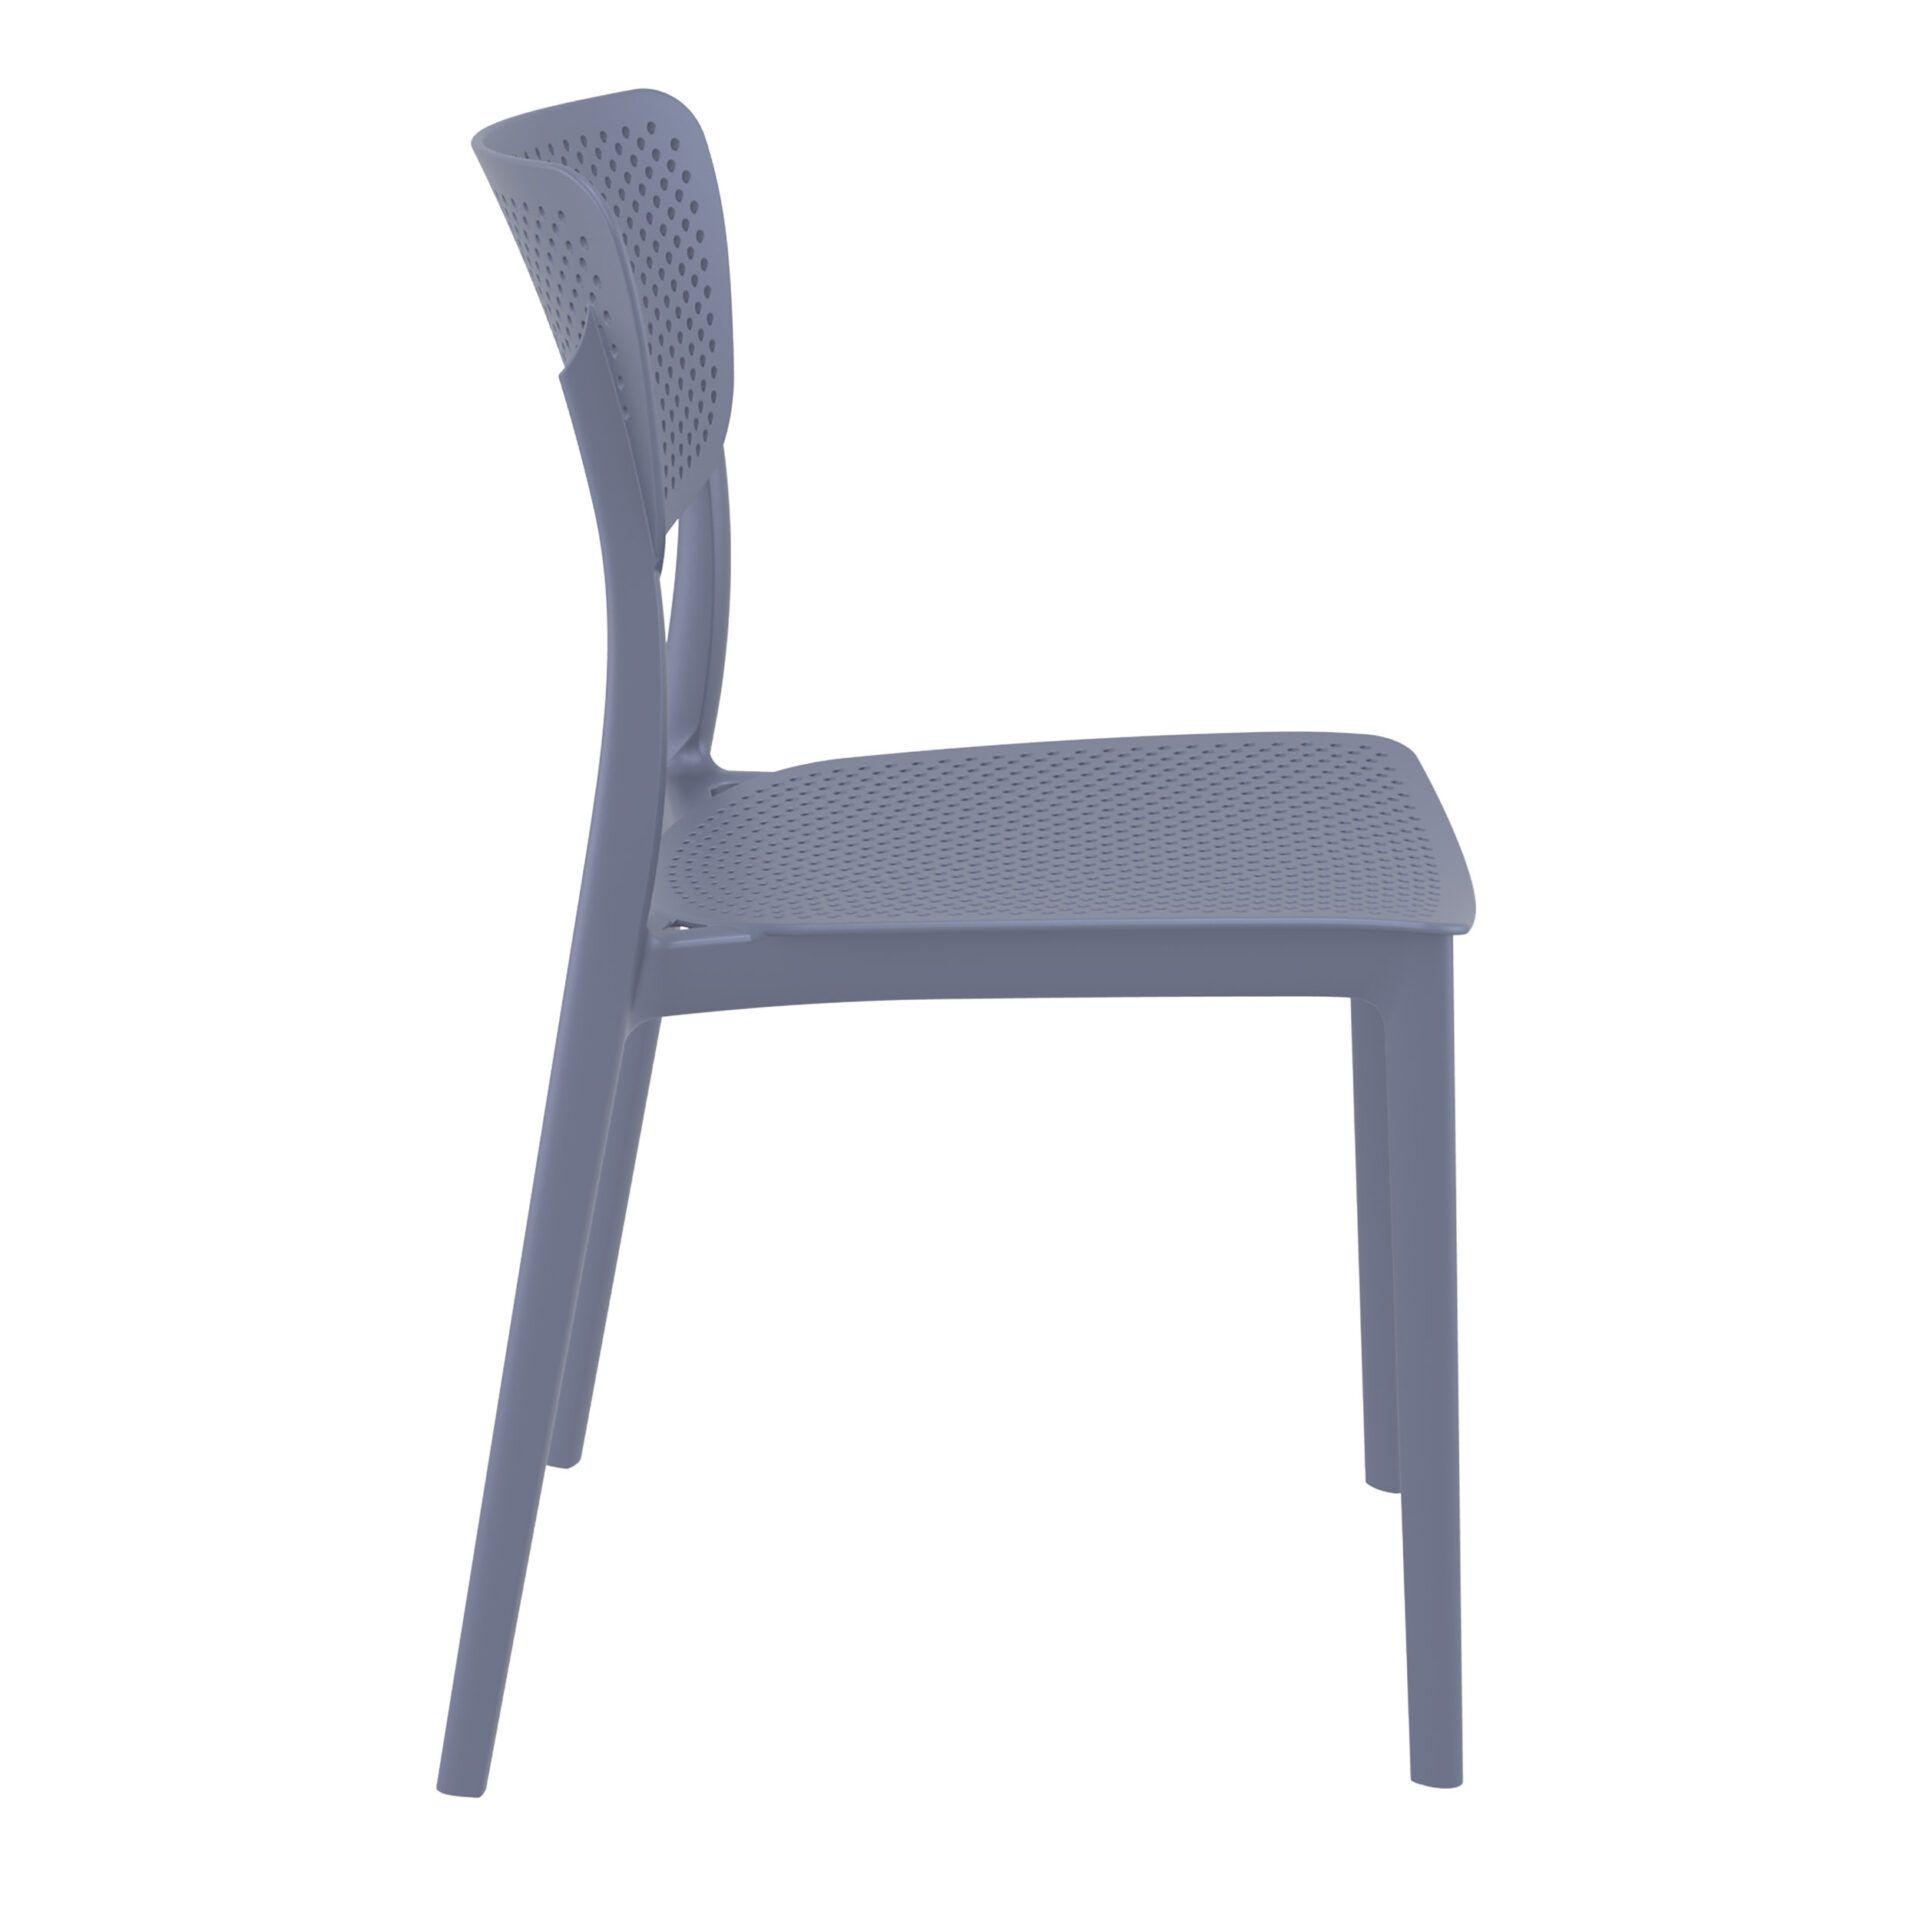 polypropylene hospitality seating lucy chair darkgrey side